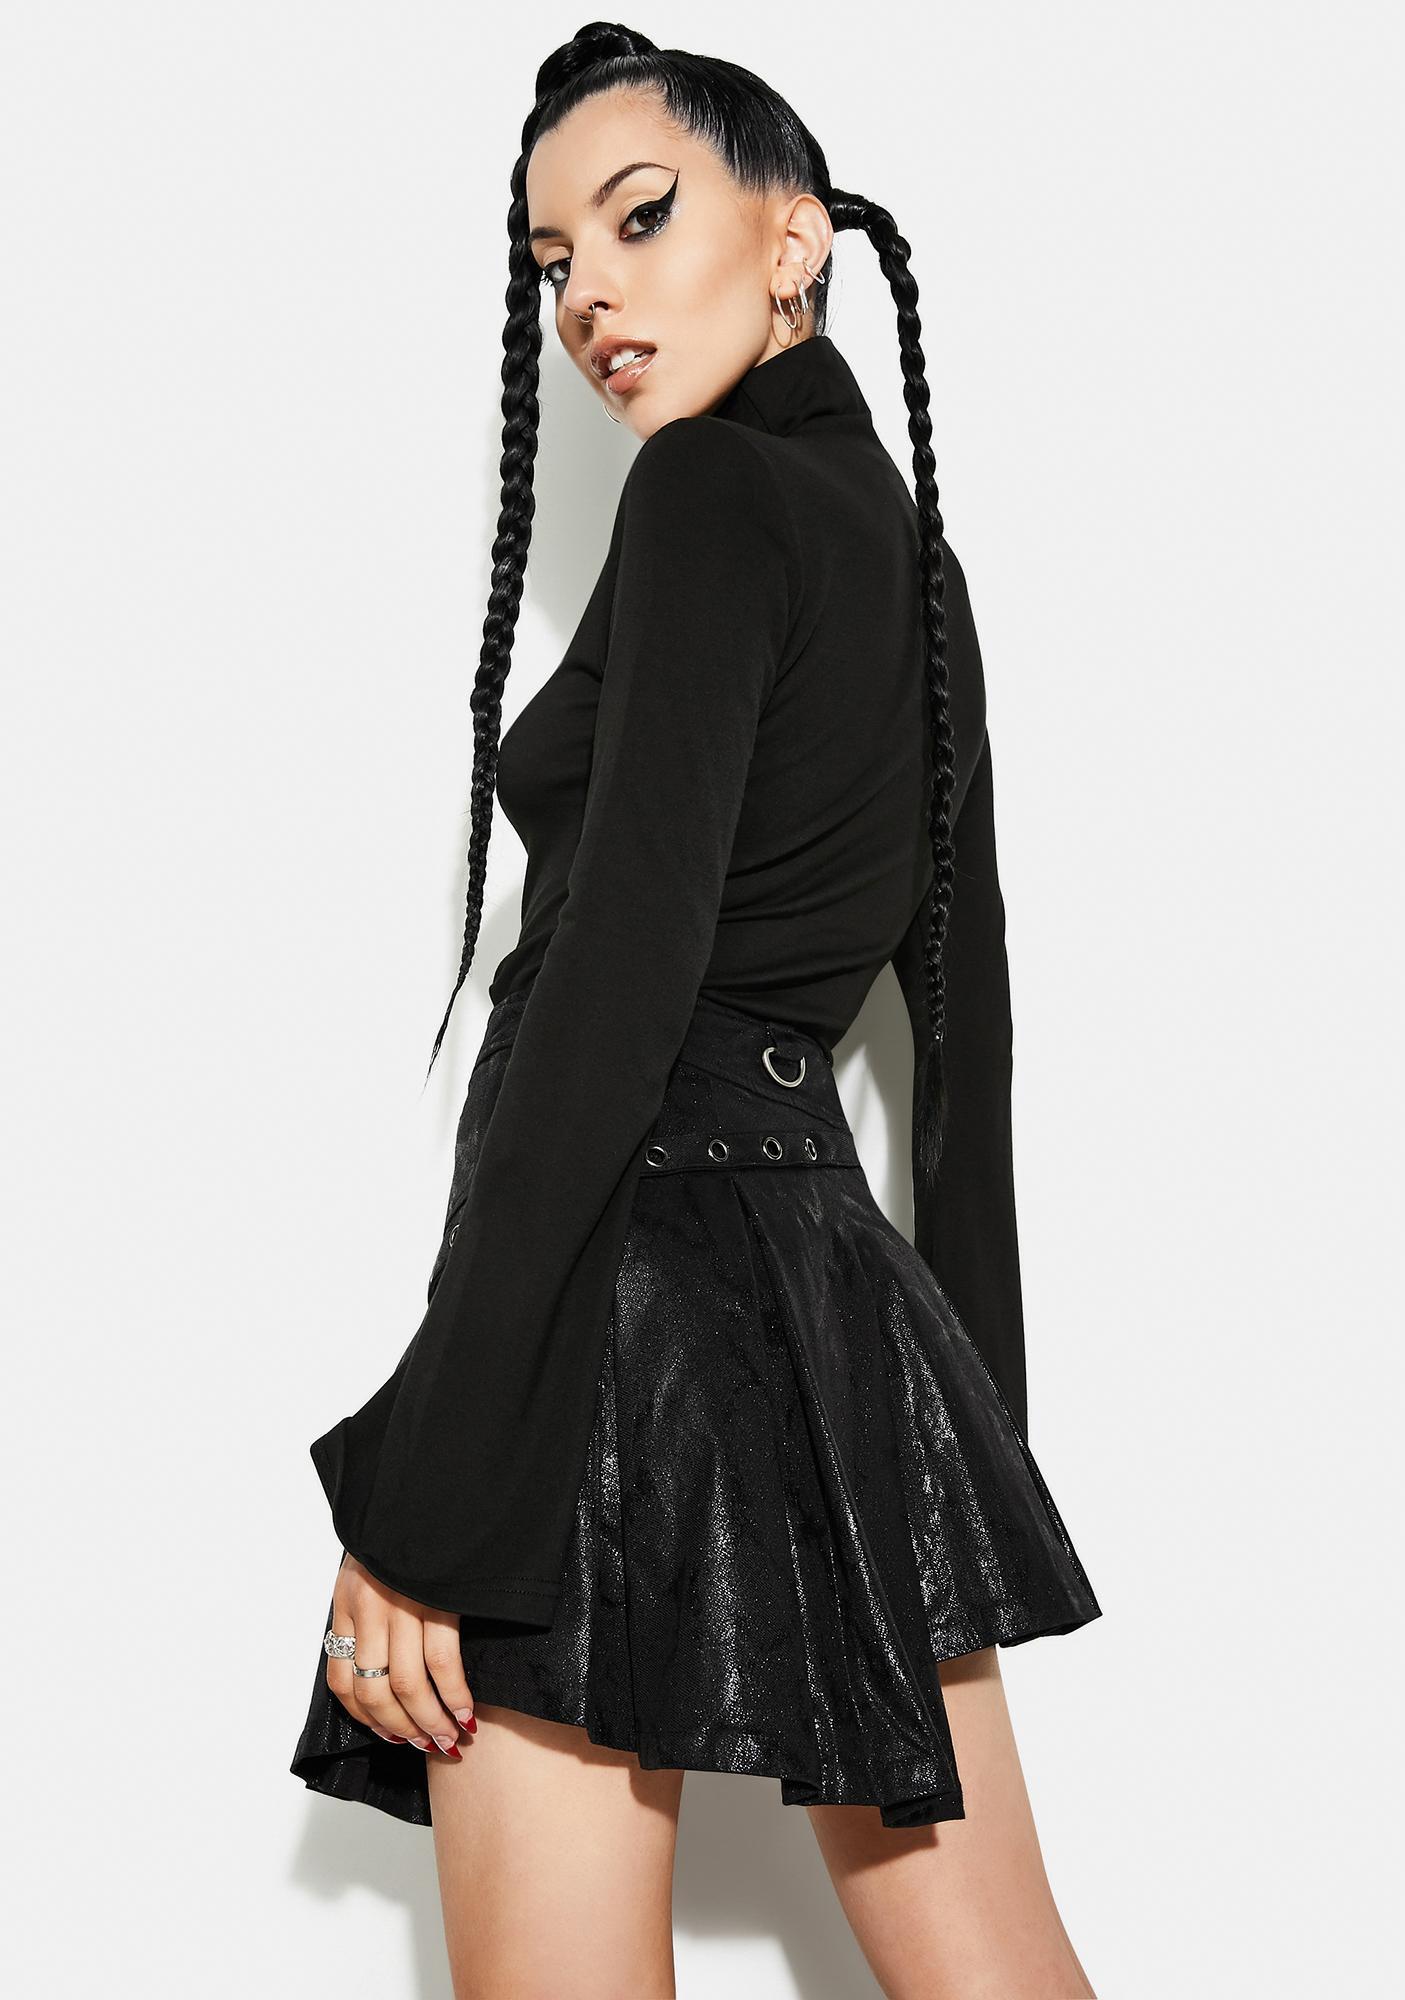 Punk Rave Asymmetrical Pleated Belt Skirt